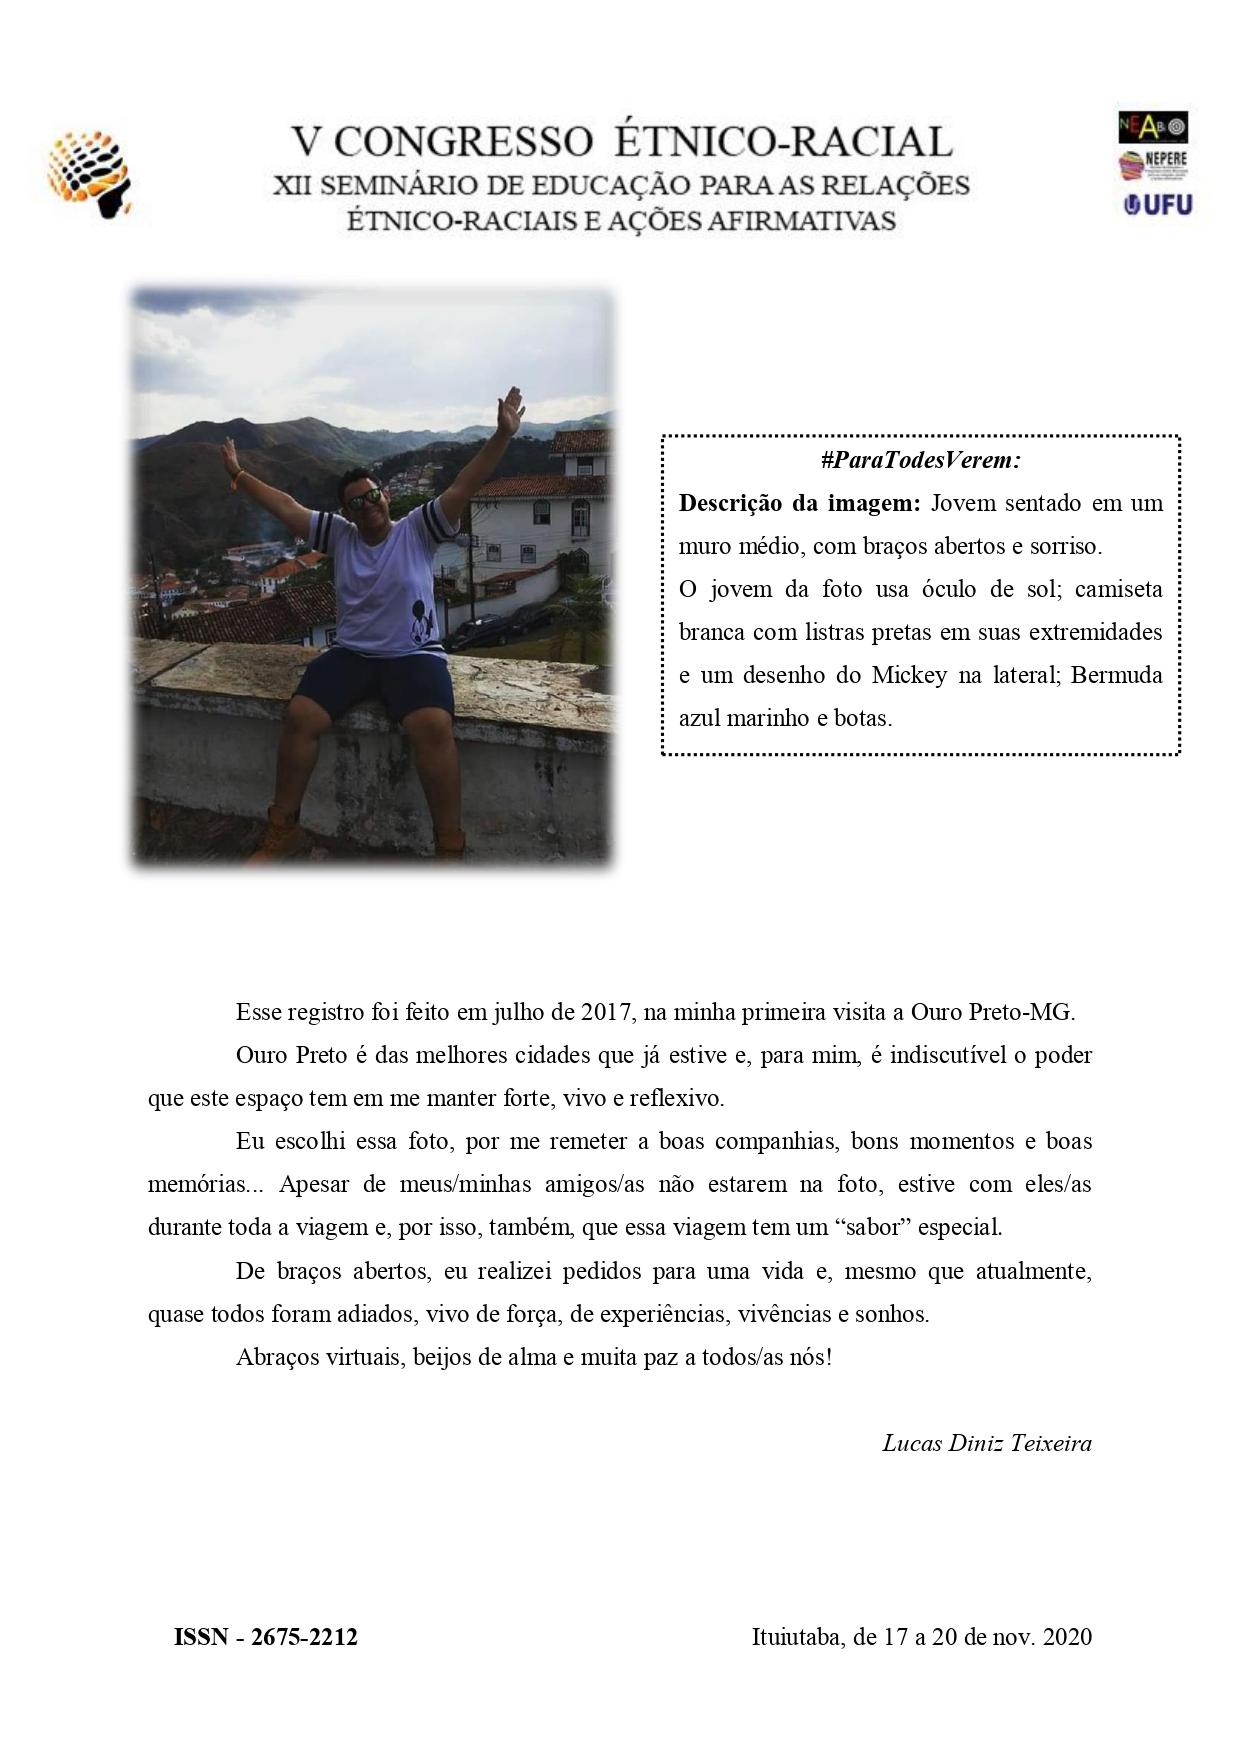 LUCAS DINIZ - IMAGEM_page-0001